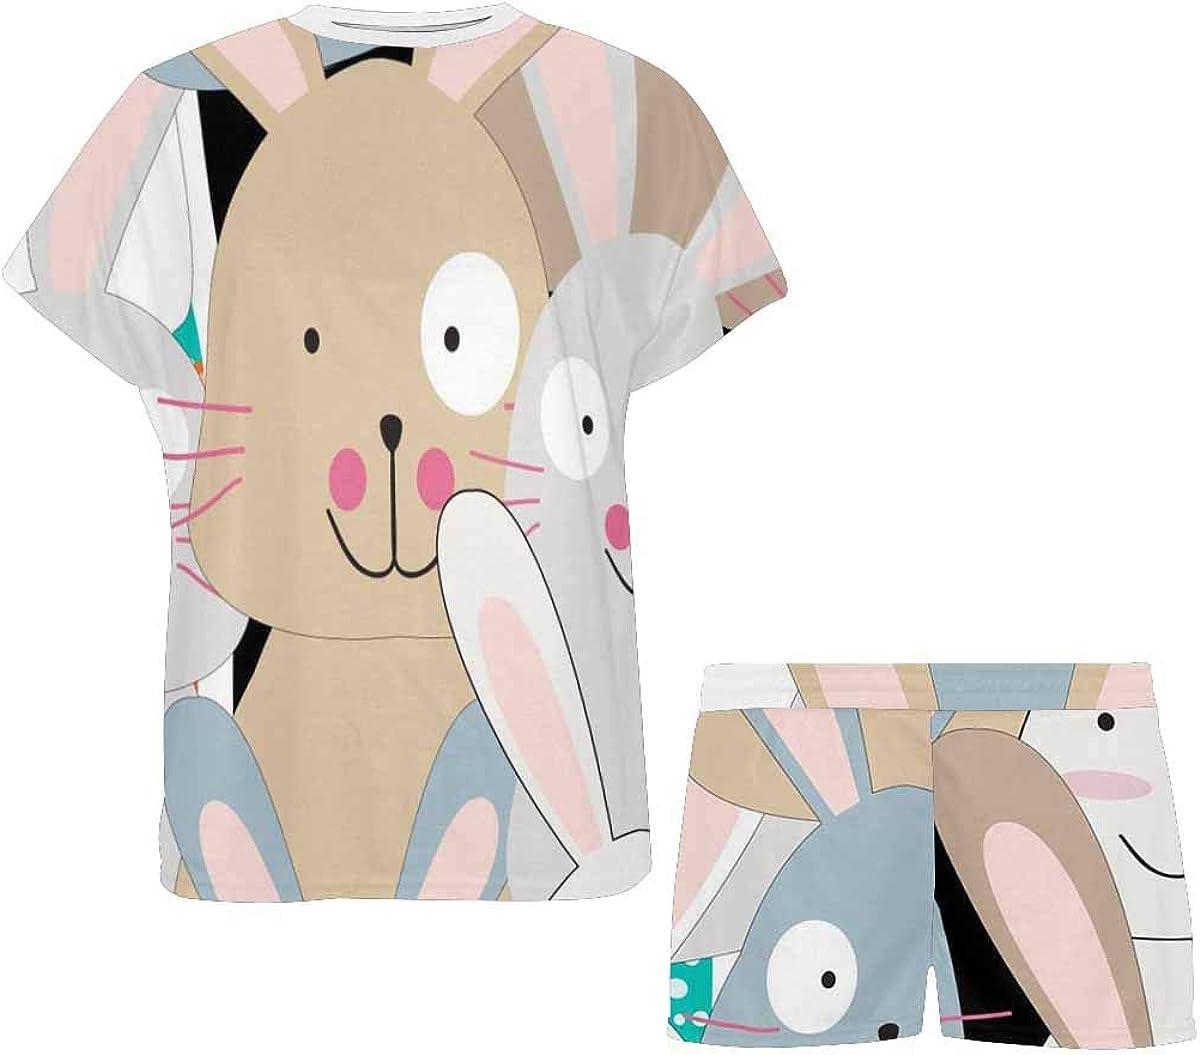 InterestPrint Funny Cute Baby Rabbit Bunny Women's Lightweight Pajama Set, Short Summer Pjs